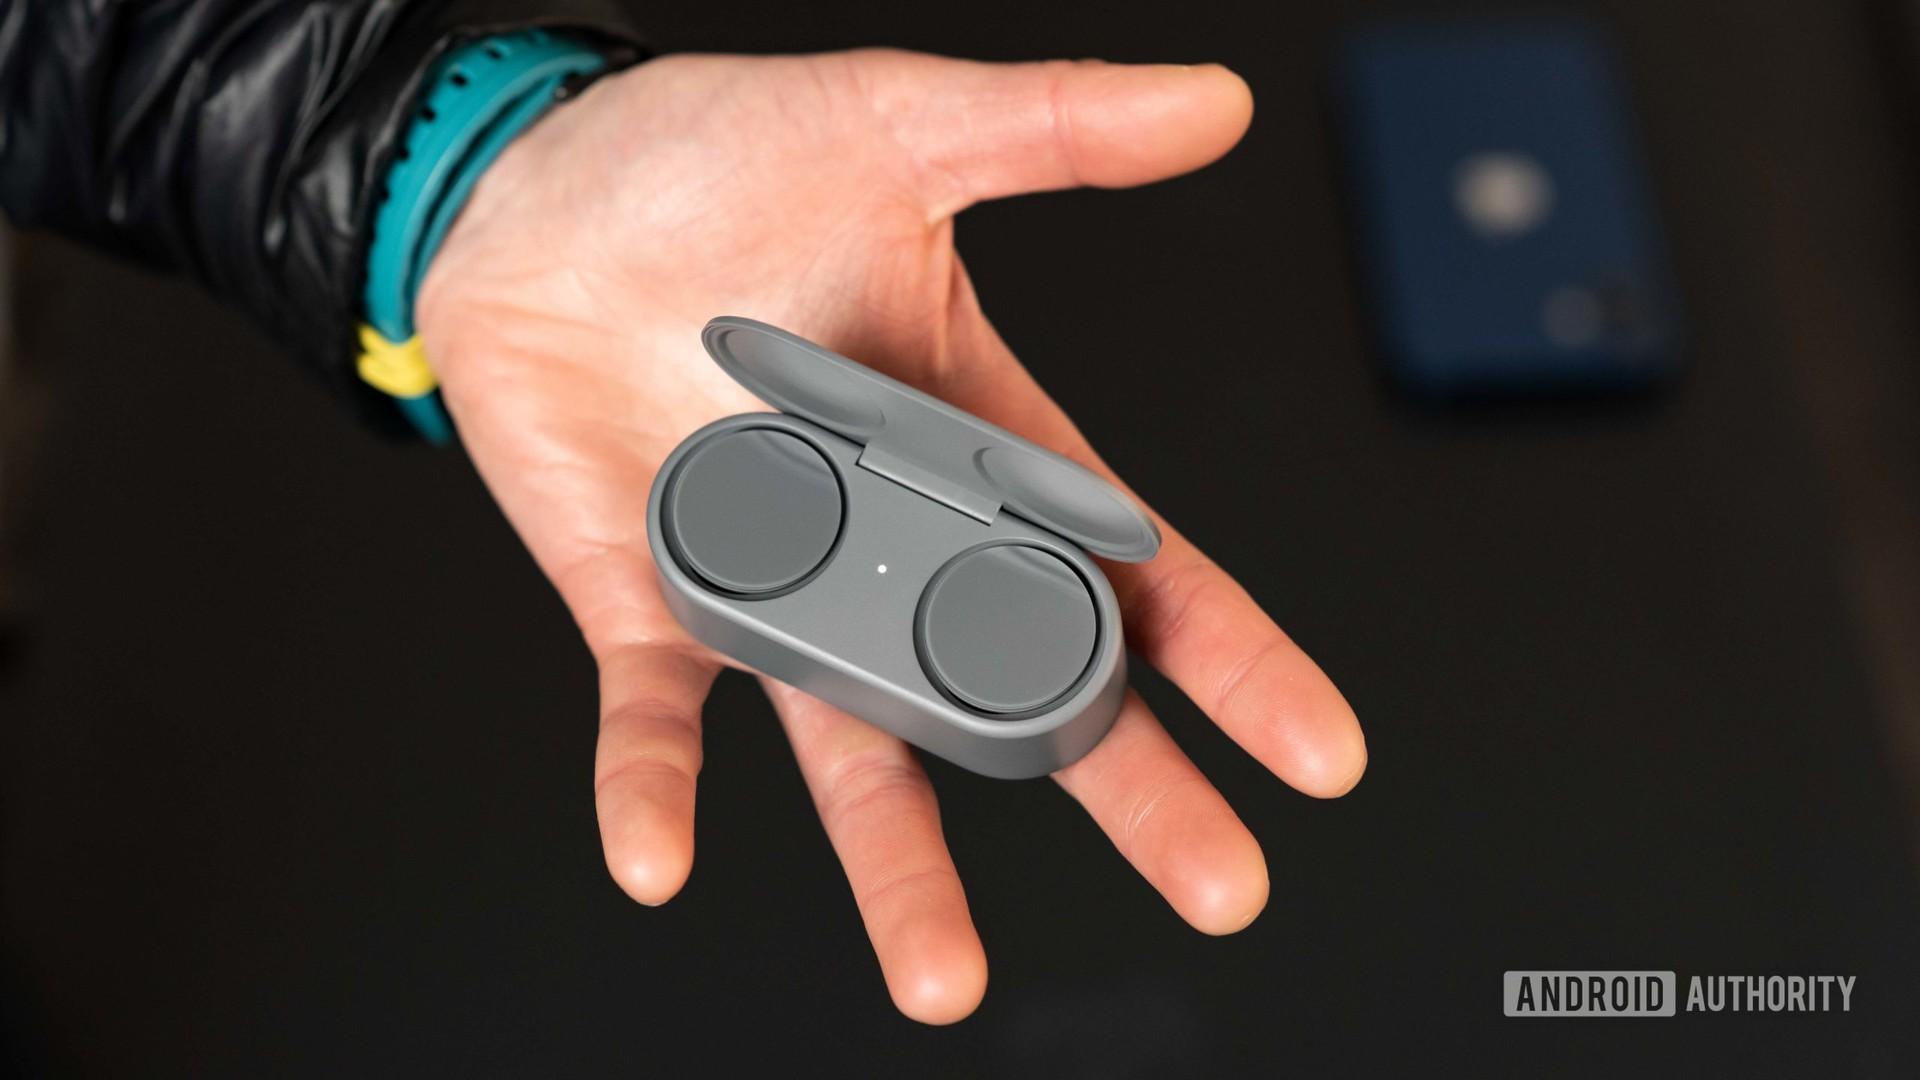 Microsoft Surface Earbuds true wireless earbuds open case hand